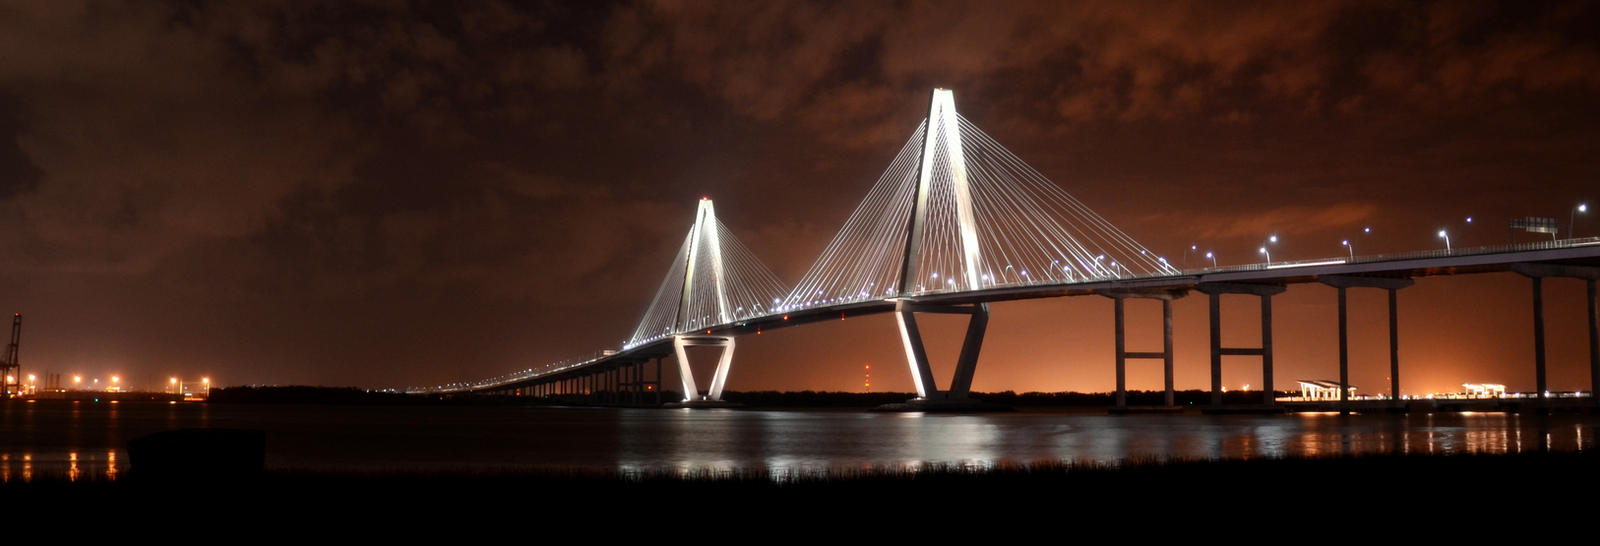 Cooper River Bridge 2 by Carise